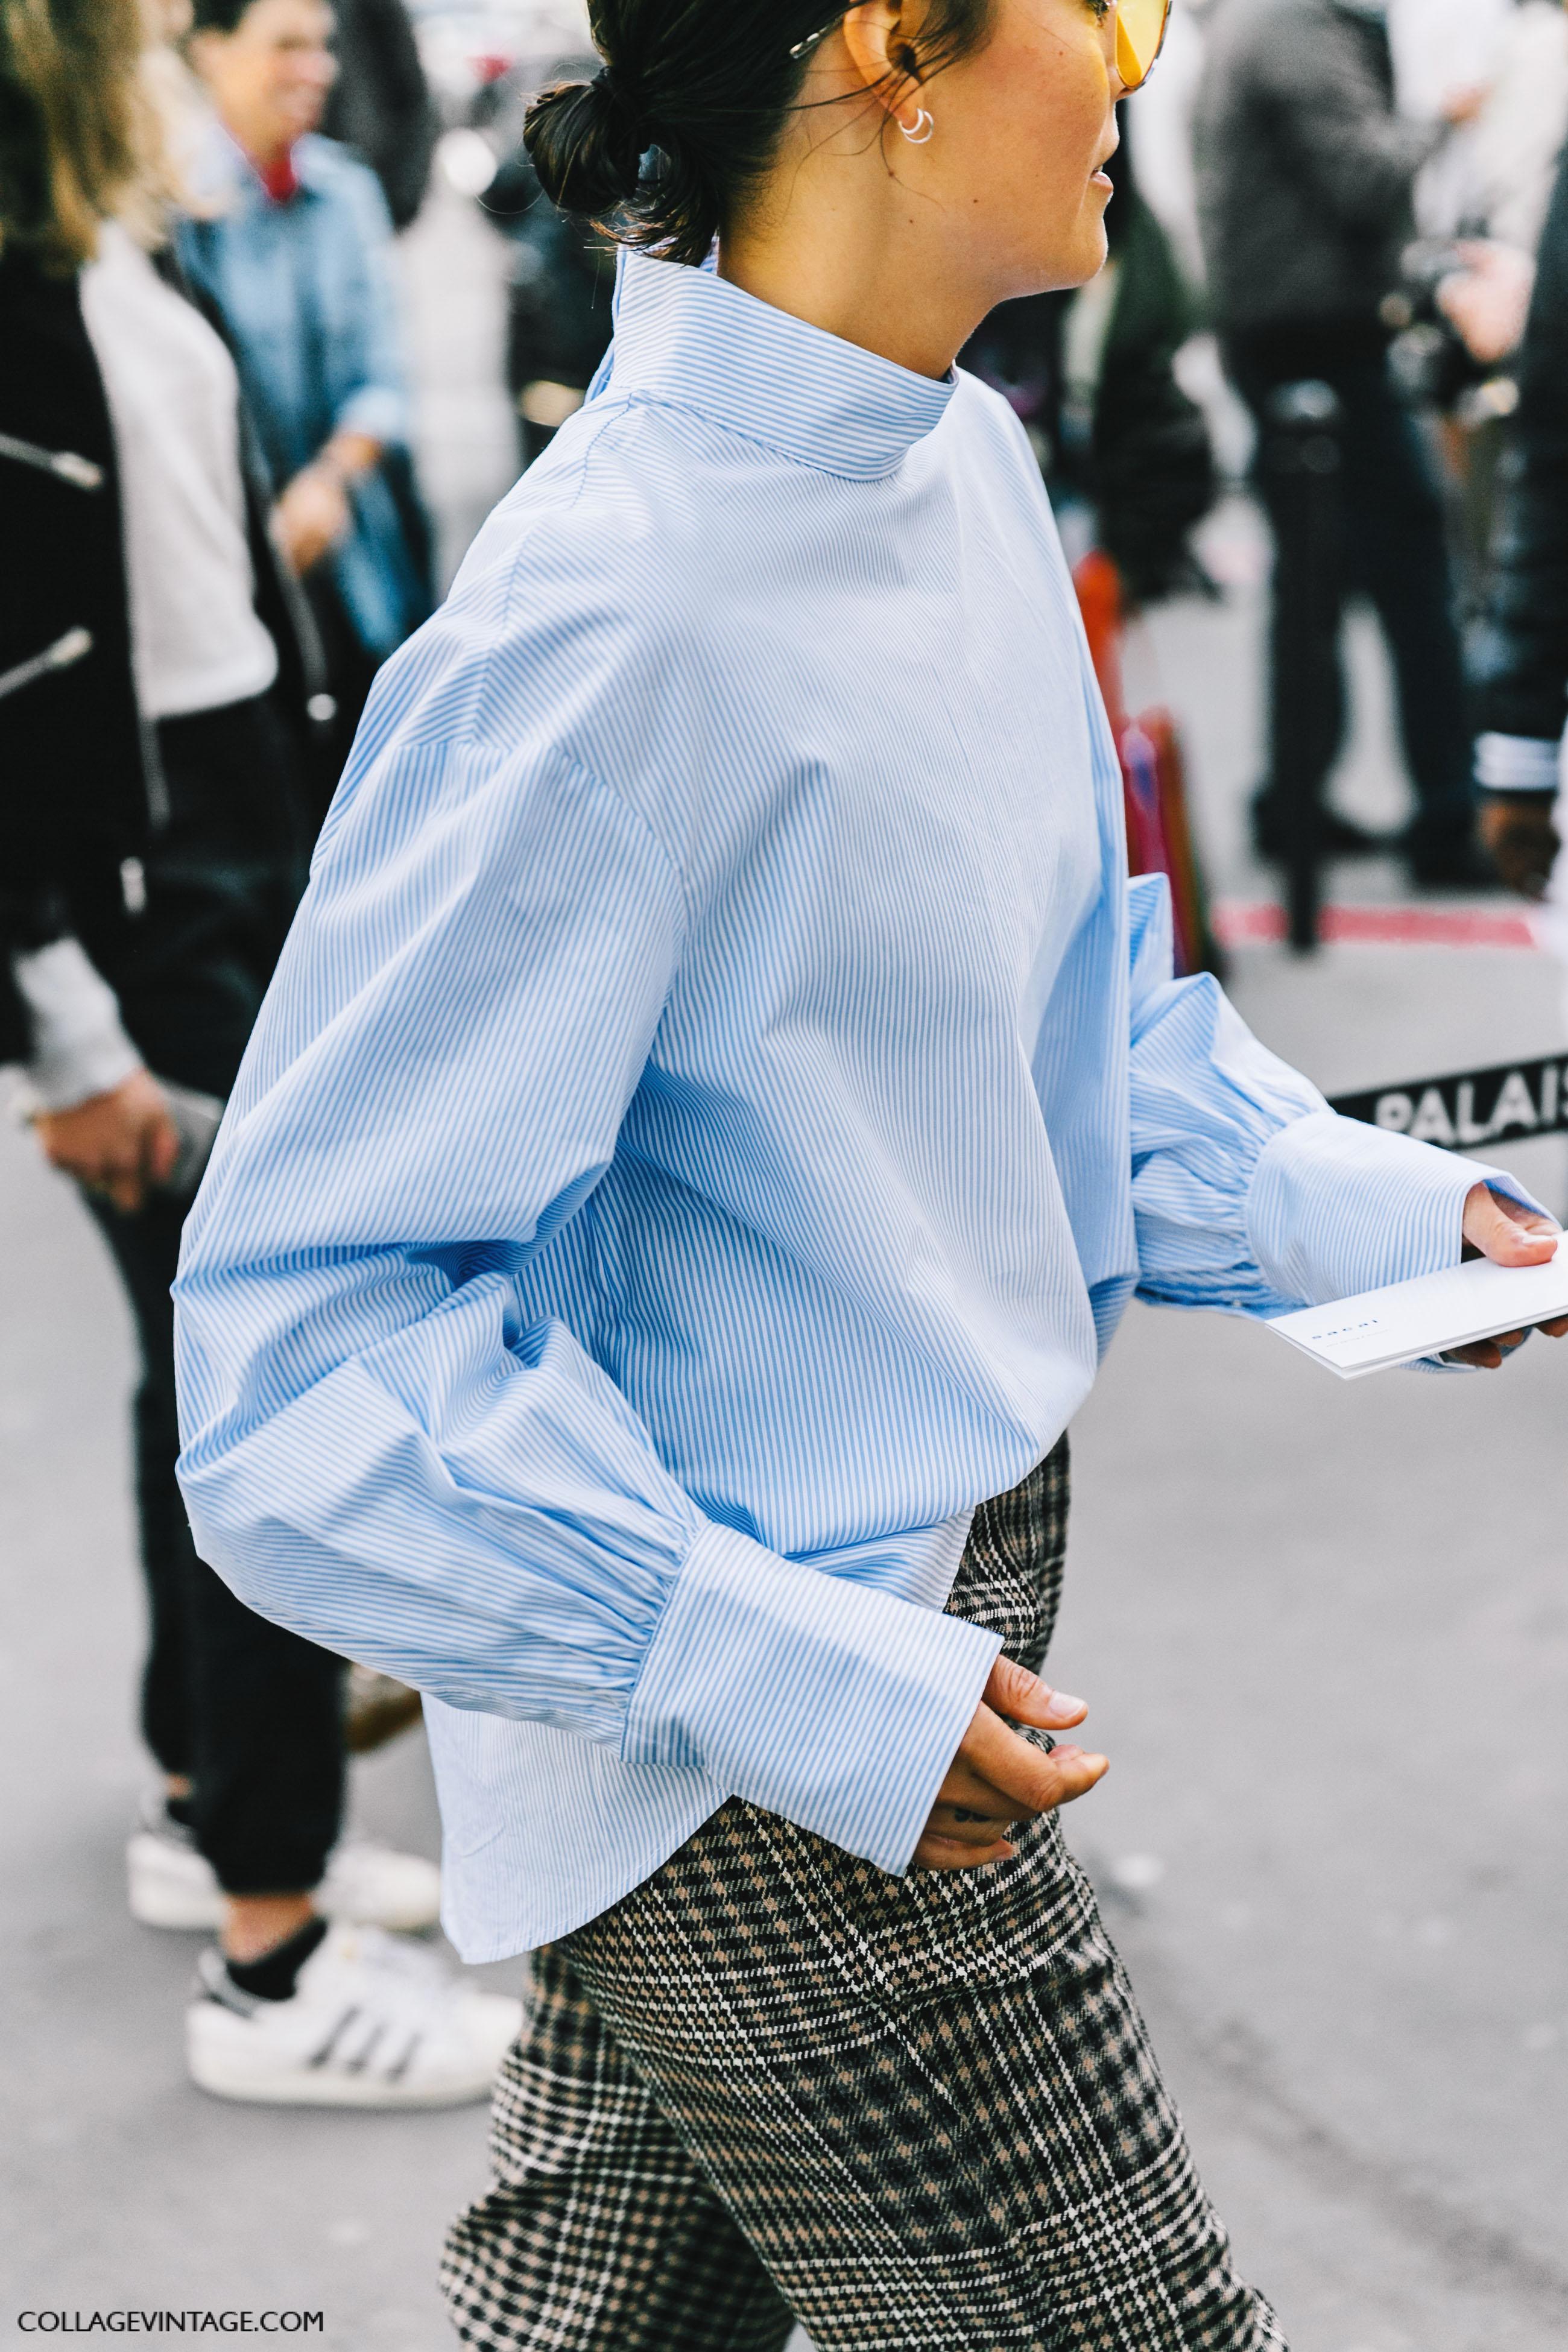 pfw-paris_fashion_week_ss17-street_style-outfits-collage_vintage-olympia_letan-hermes-stella_mccartney-sacai-54